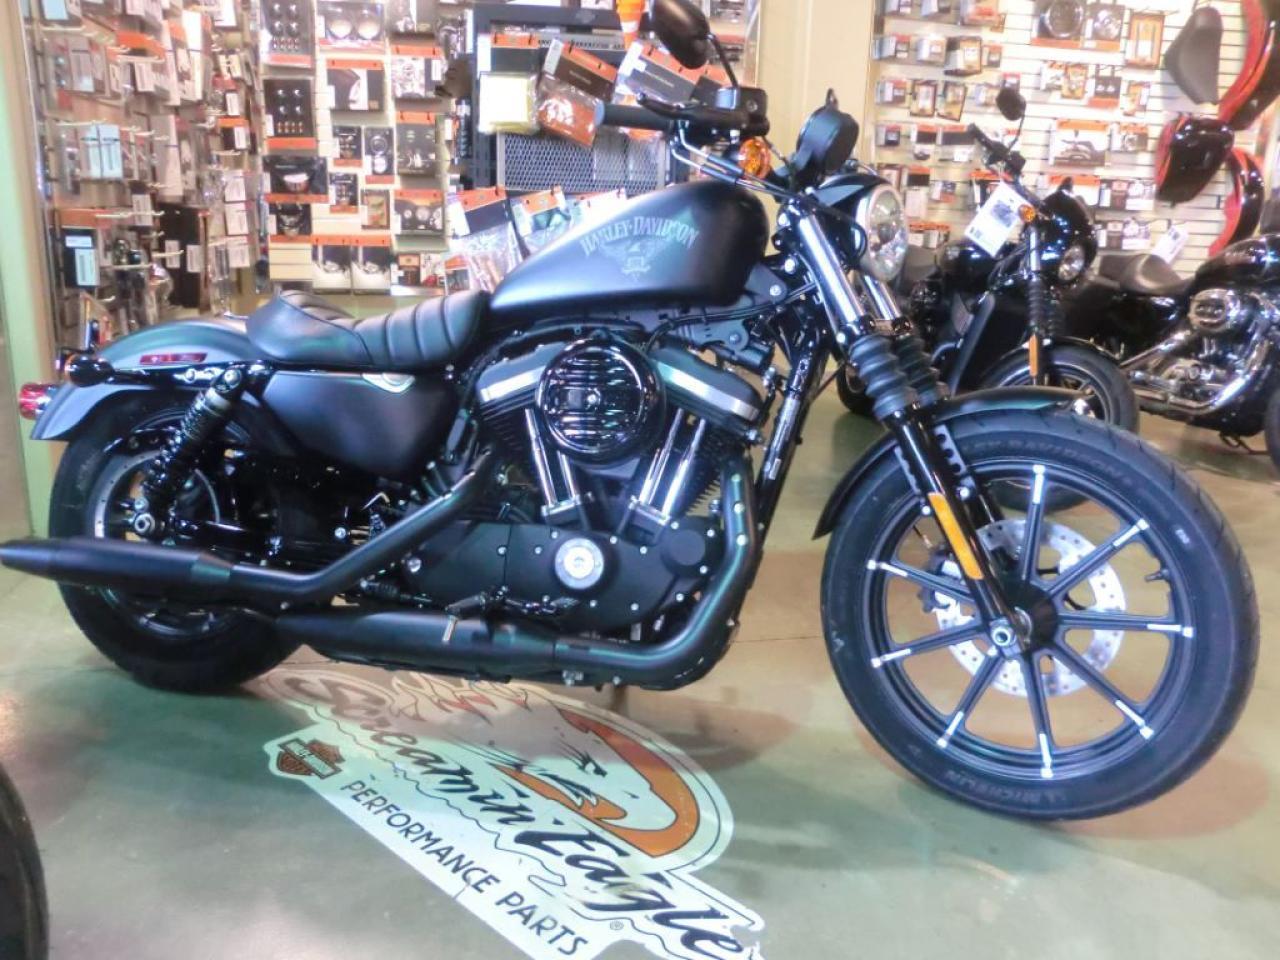 2017 Harley-Davidson Sportster 883 XL 883N IRON